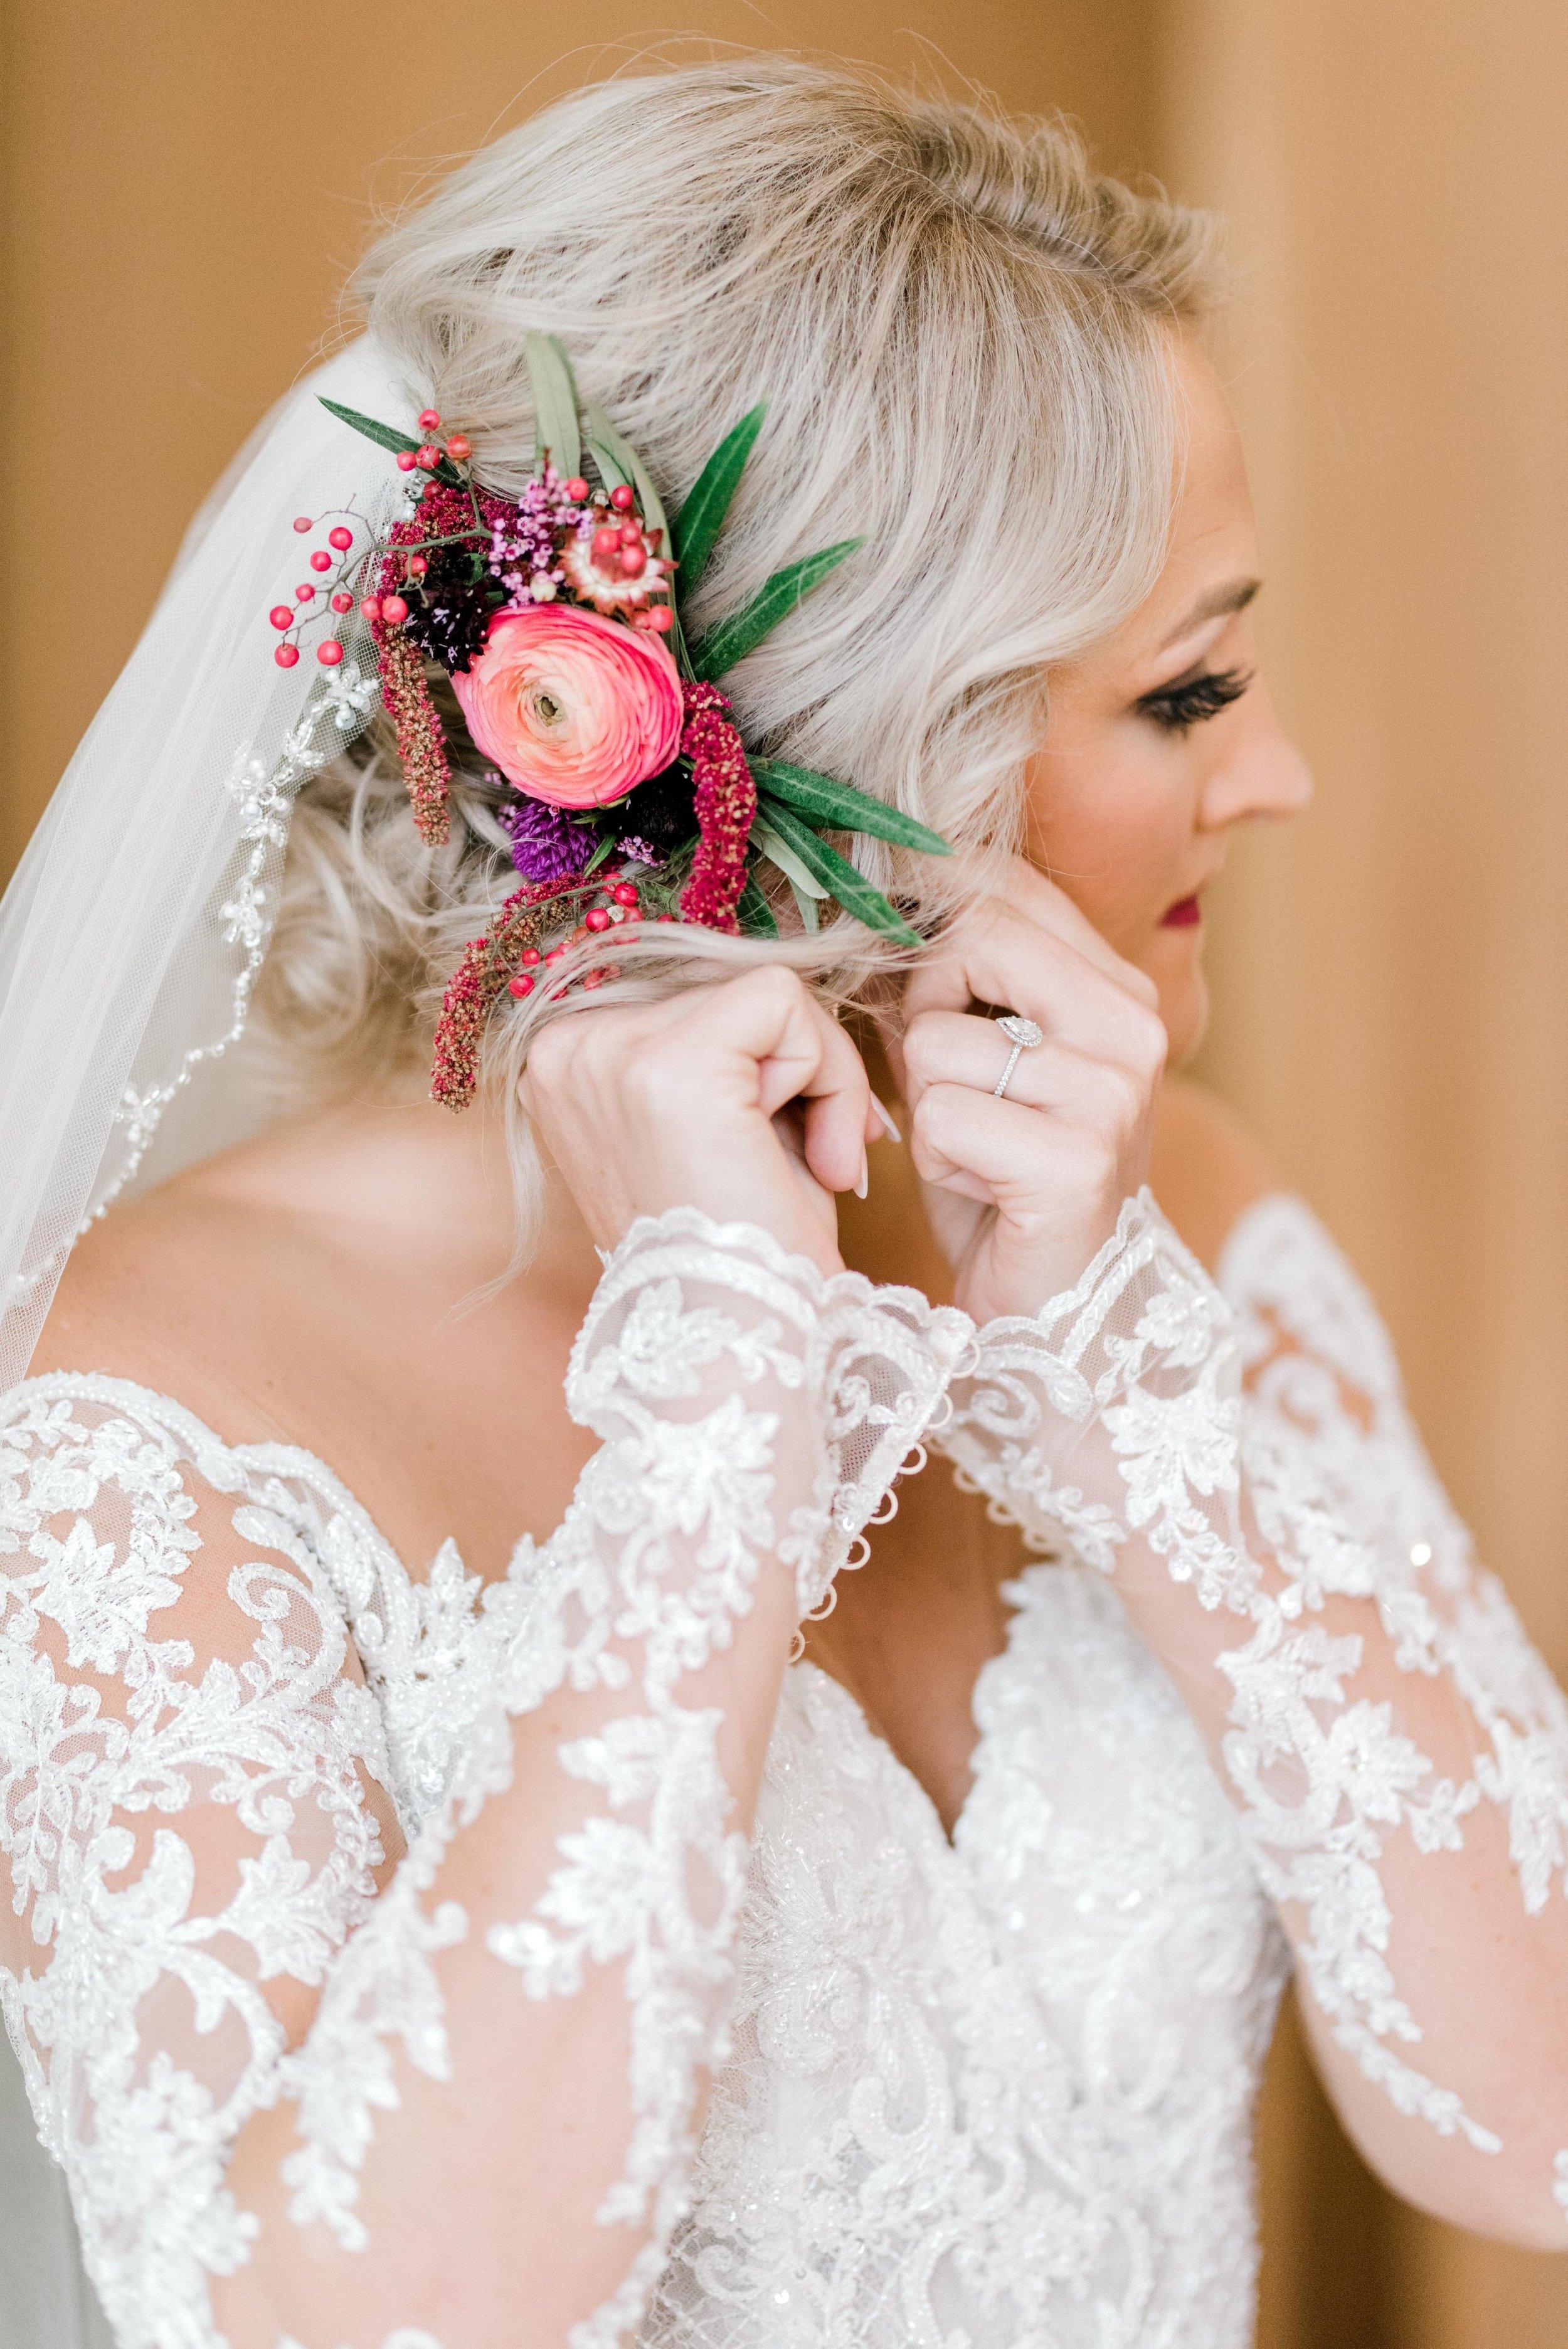 Ryan Alexa Married-Getting Ready First Look-0095.jpg